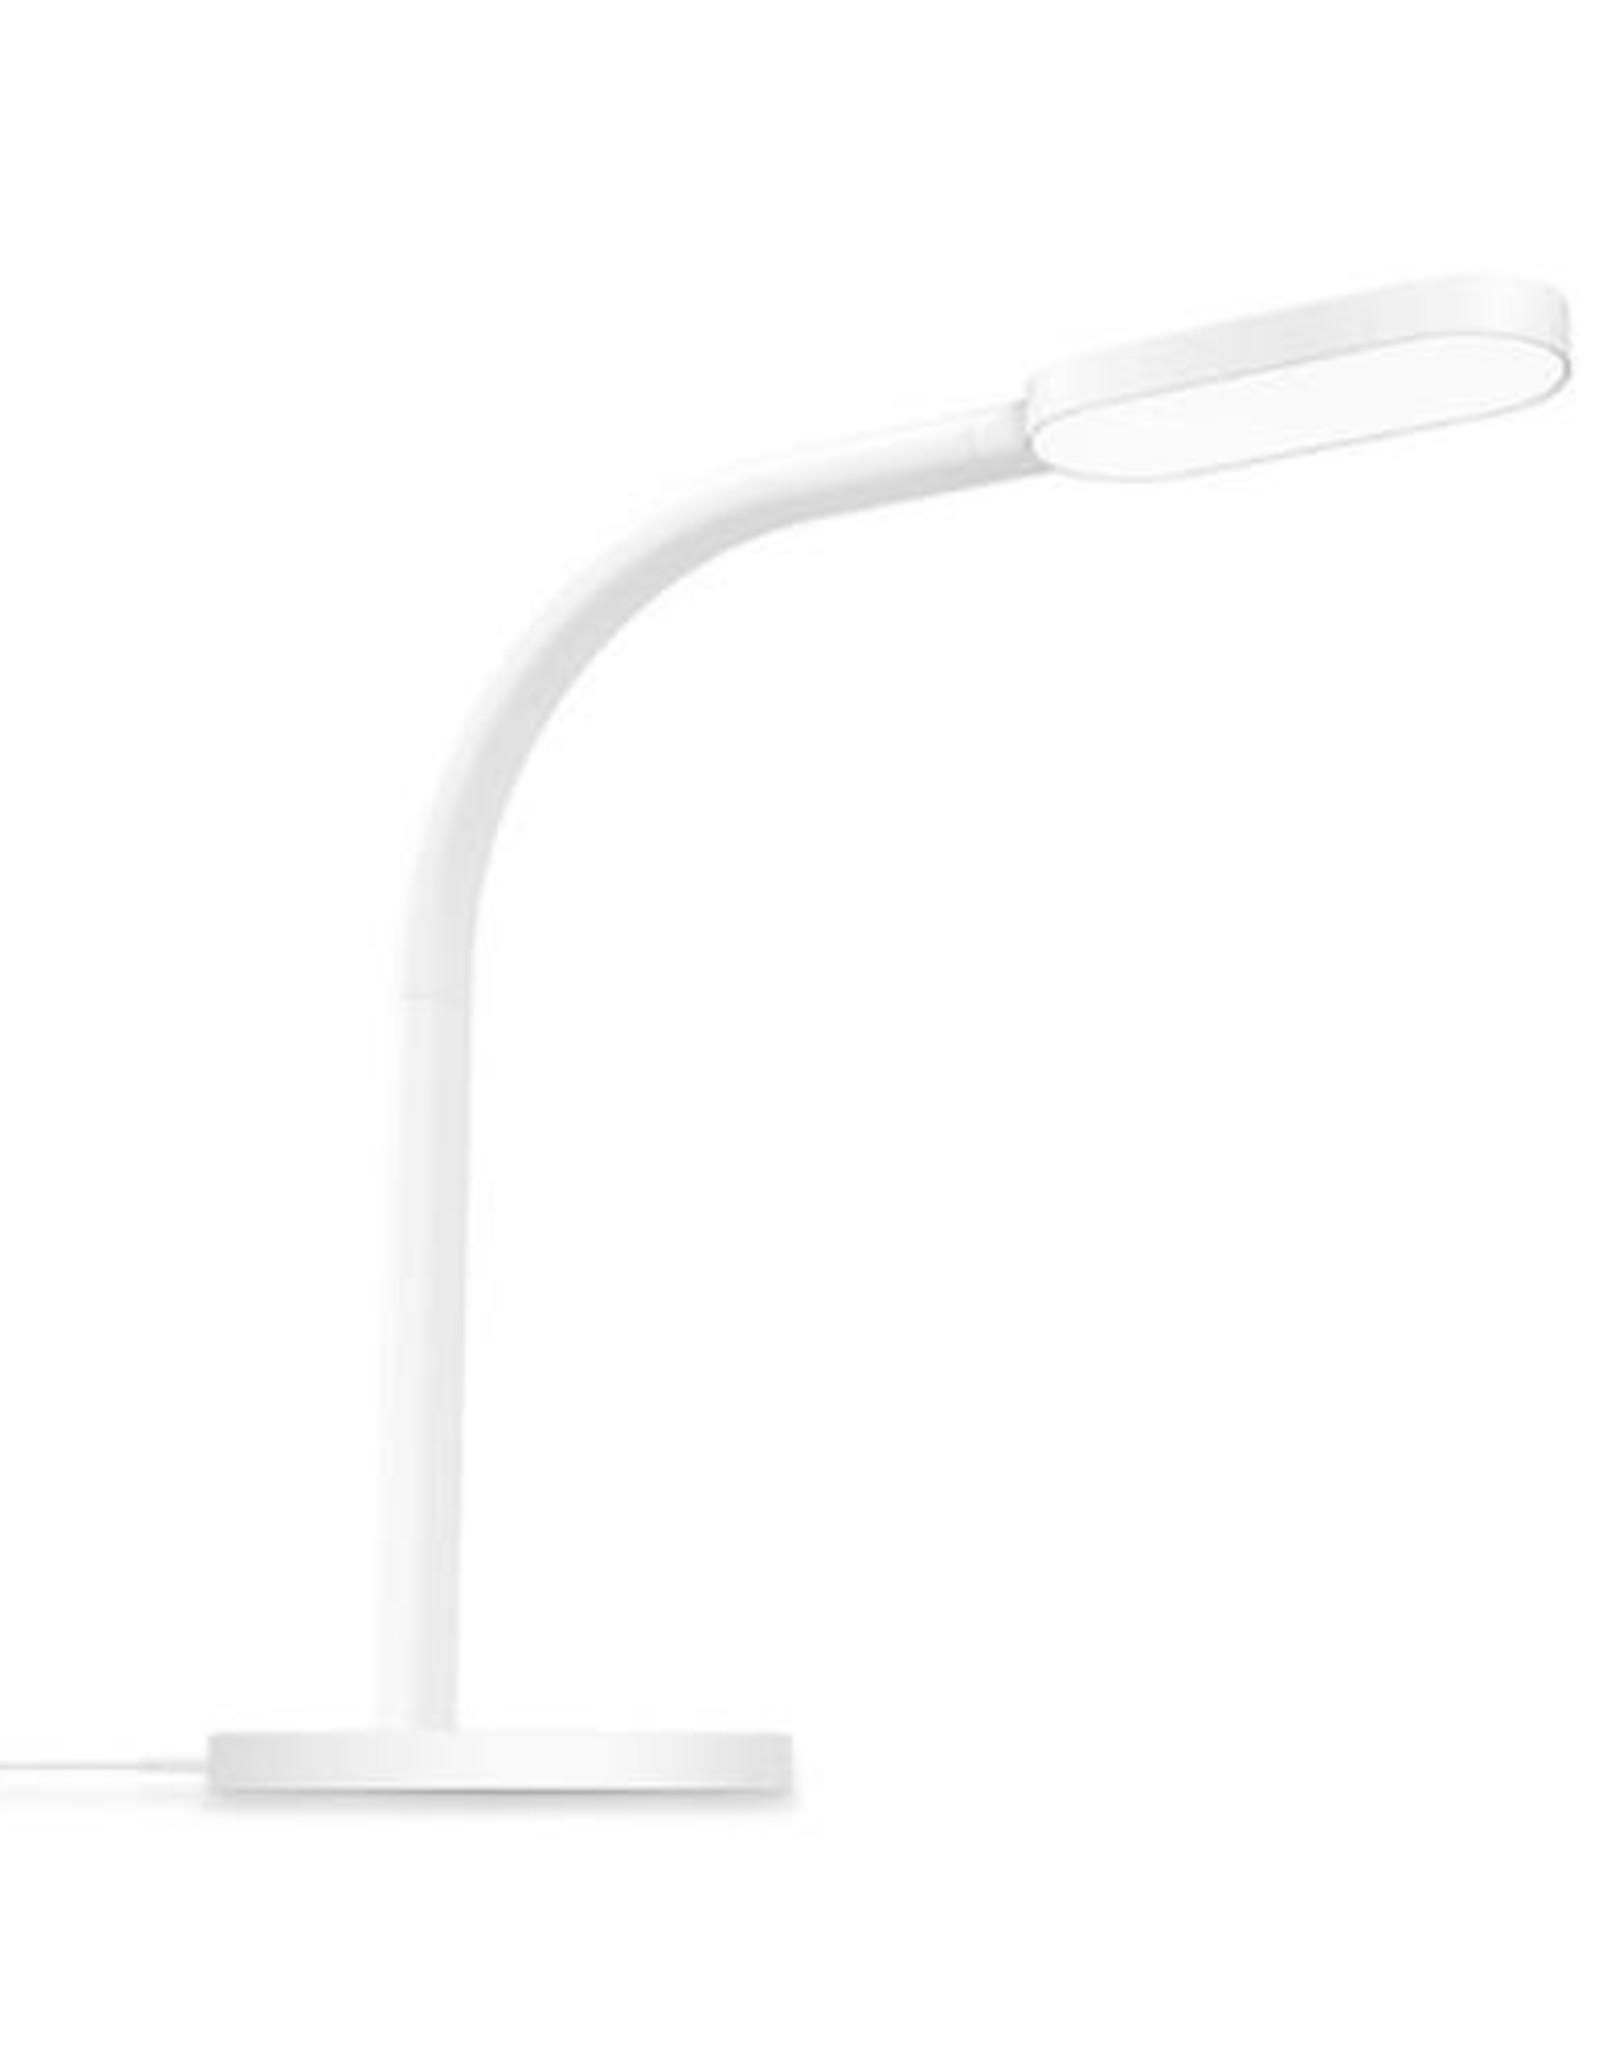 MUE4078RT tafellamp Wit SMD LED Module 5 W LED